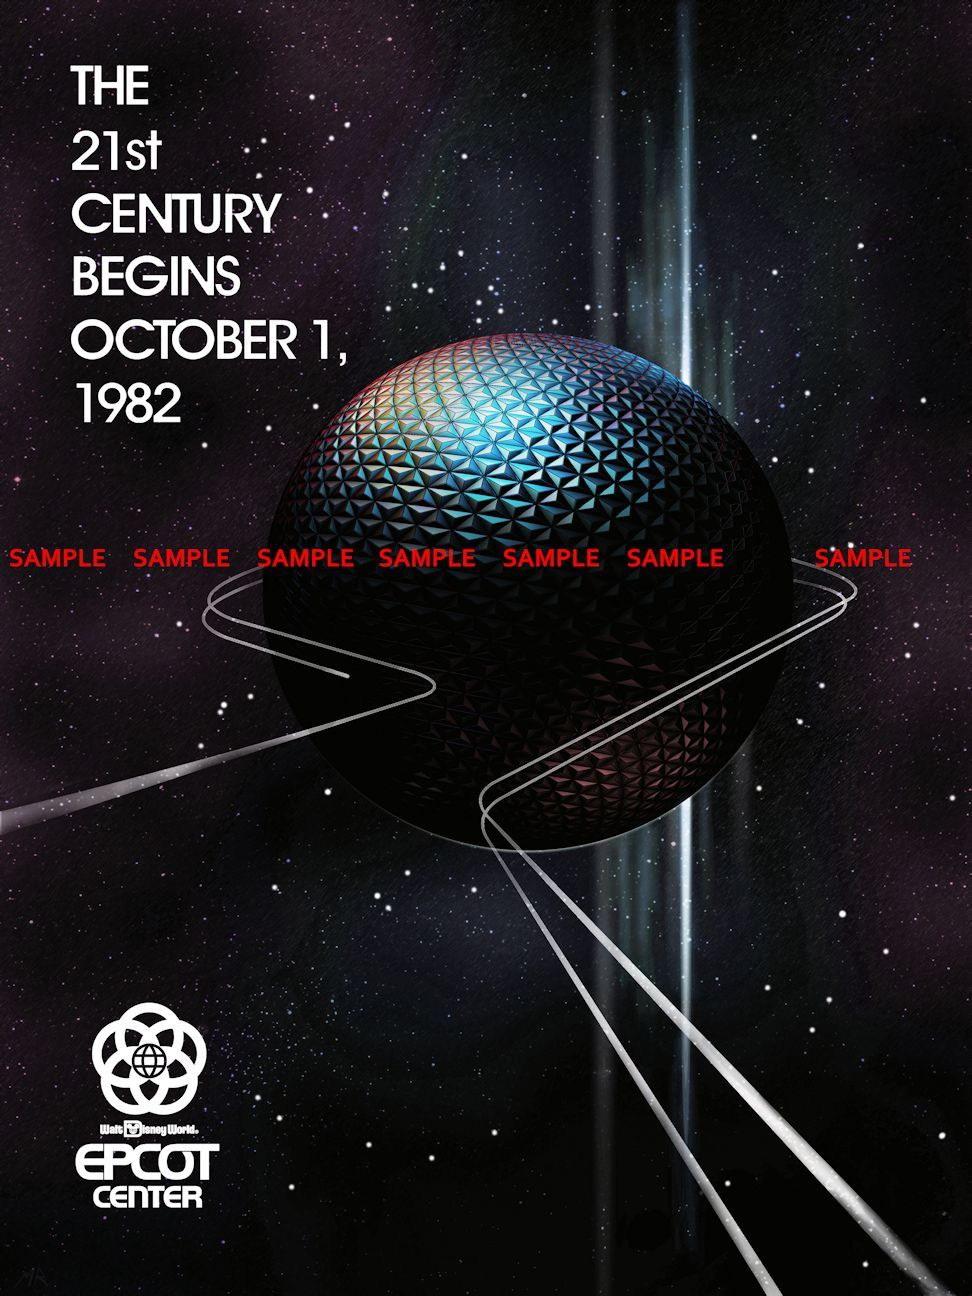 100048 Epcot Center 1982 Decor WALL PRINT POSTER US